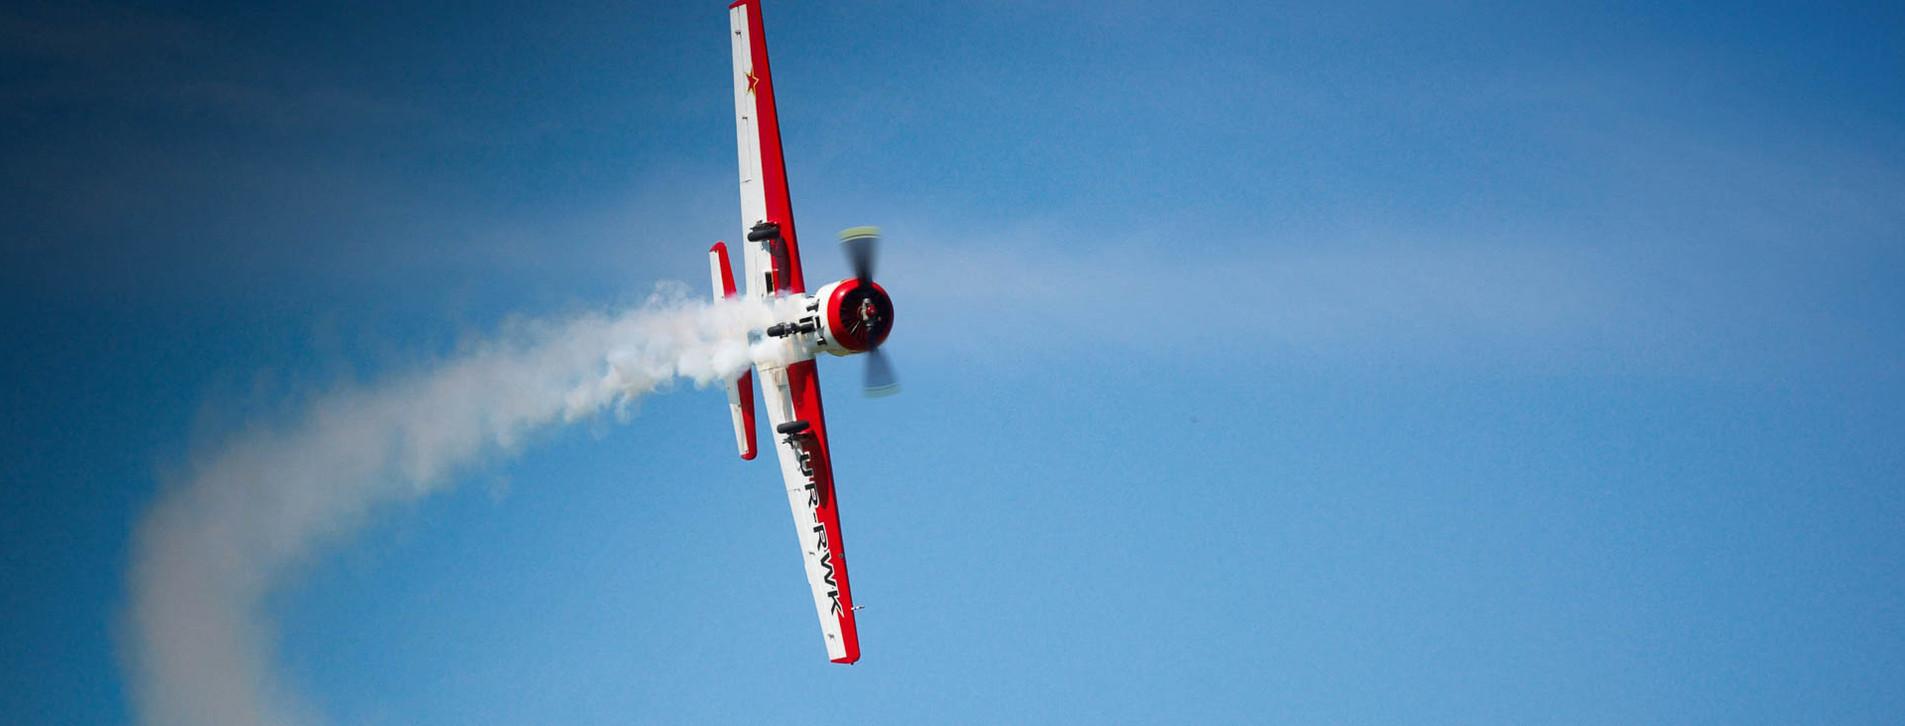 Фото - Фигуры высшего пилотажа на ЯК-52